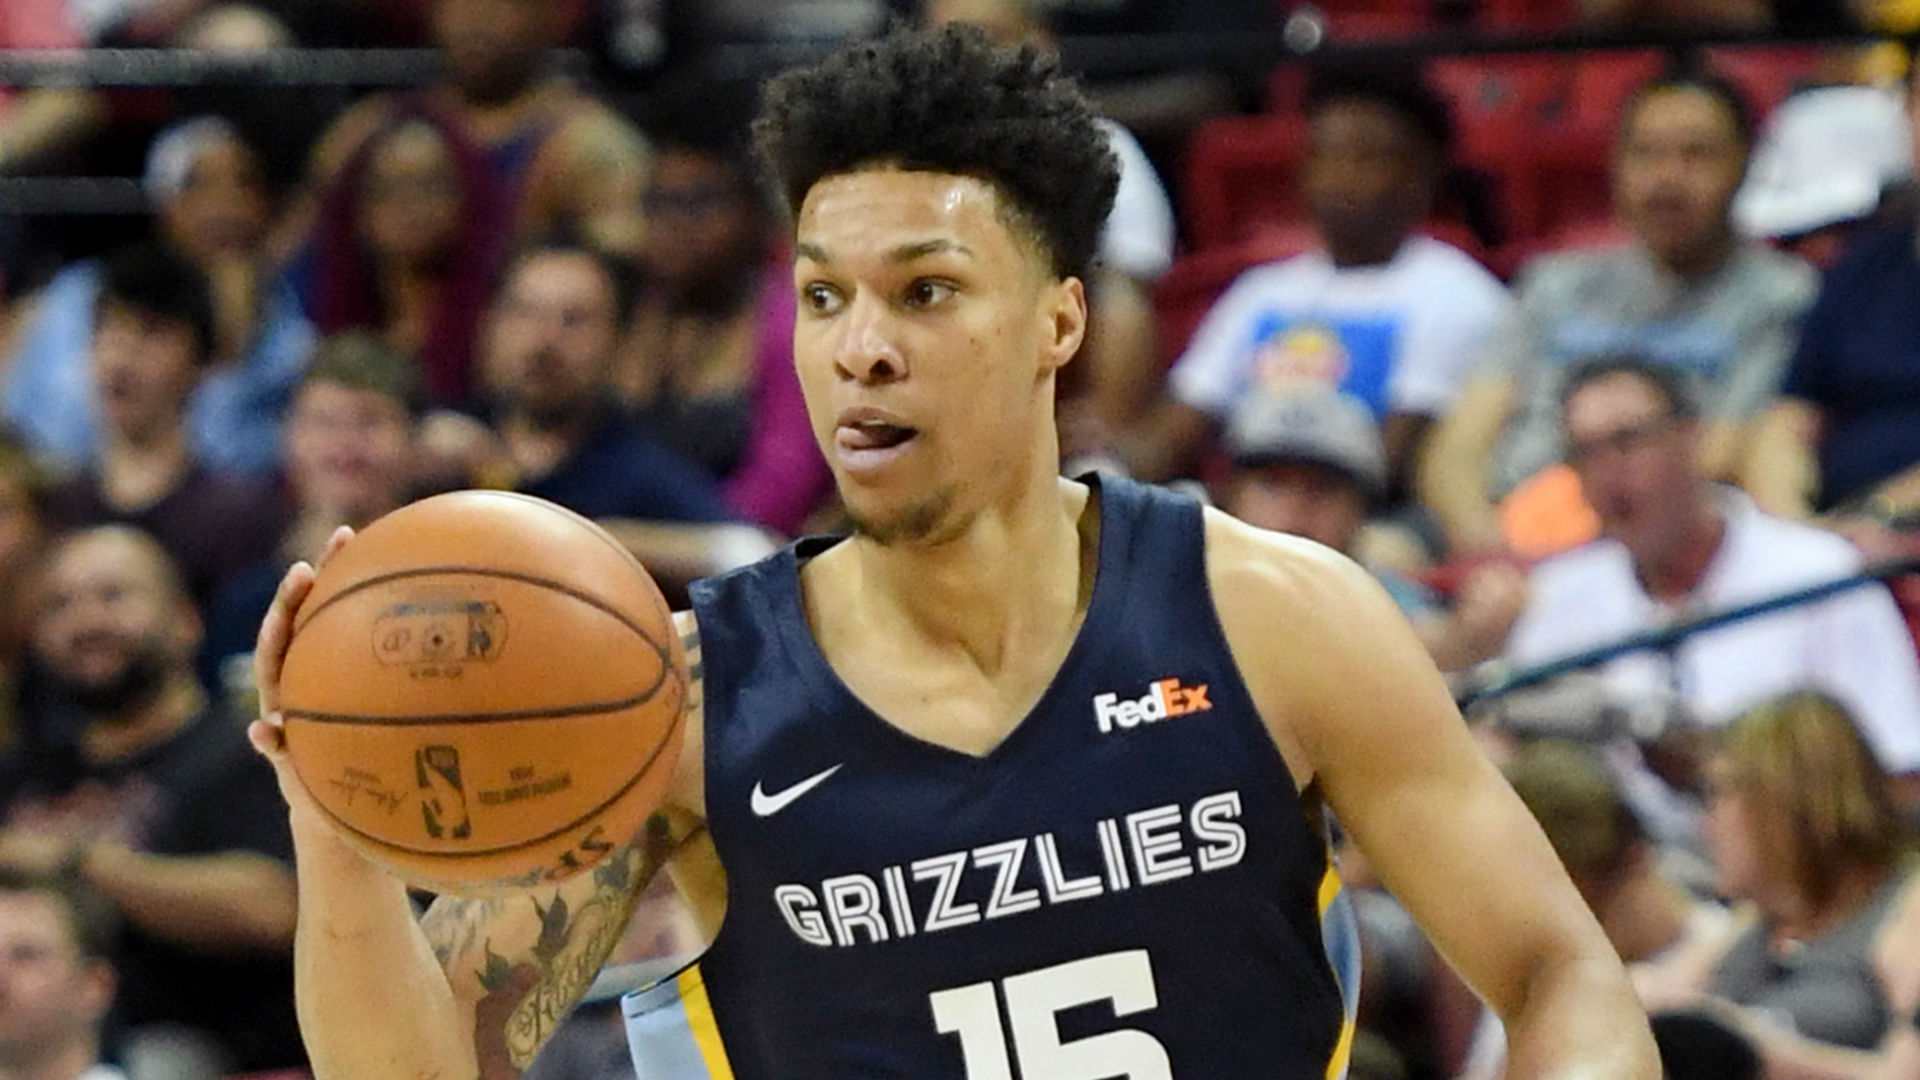 Grizzlies' Brandon Clarke named 2019 NBA Summer League MVP